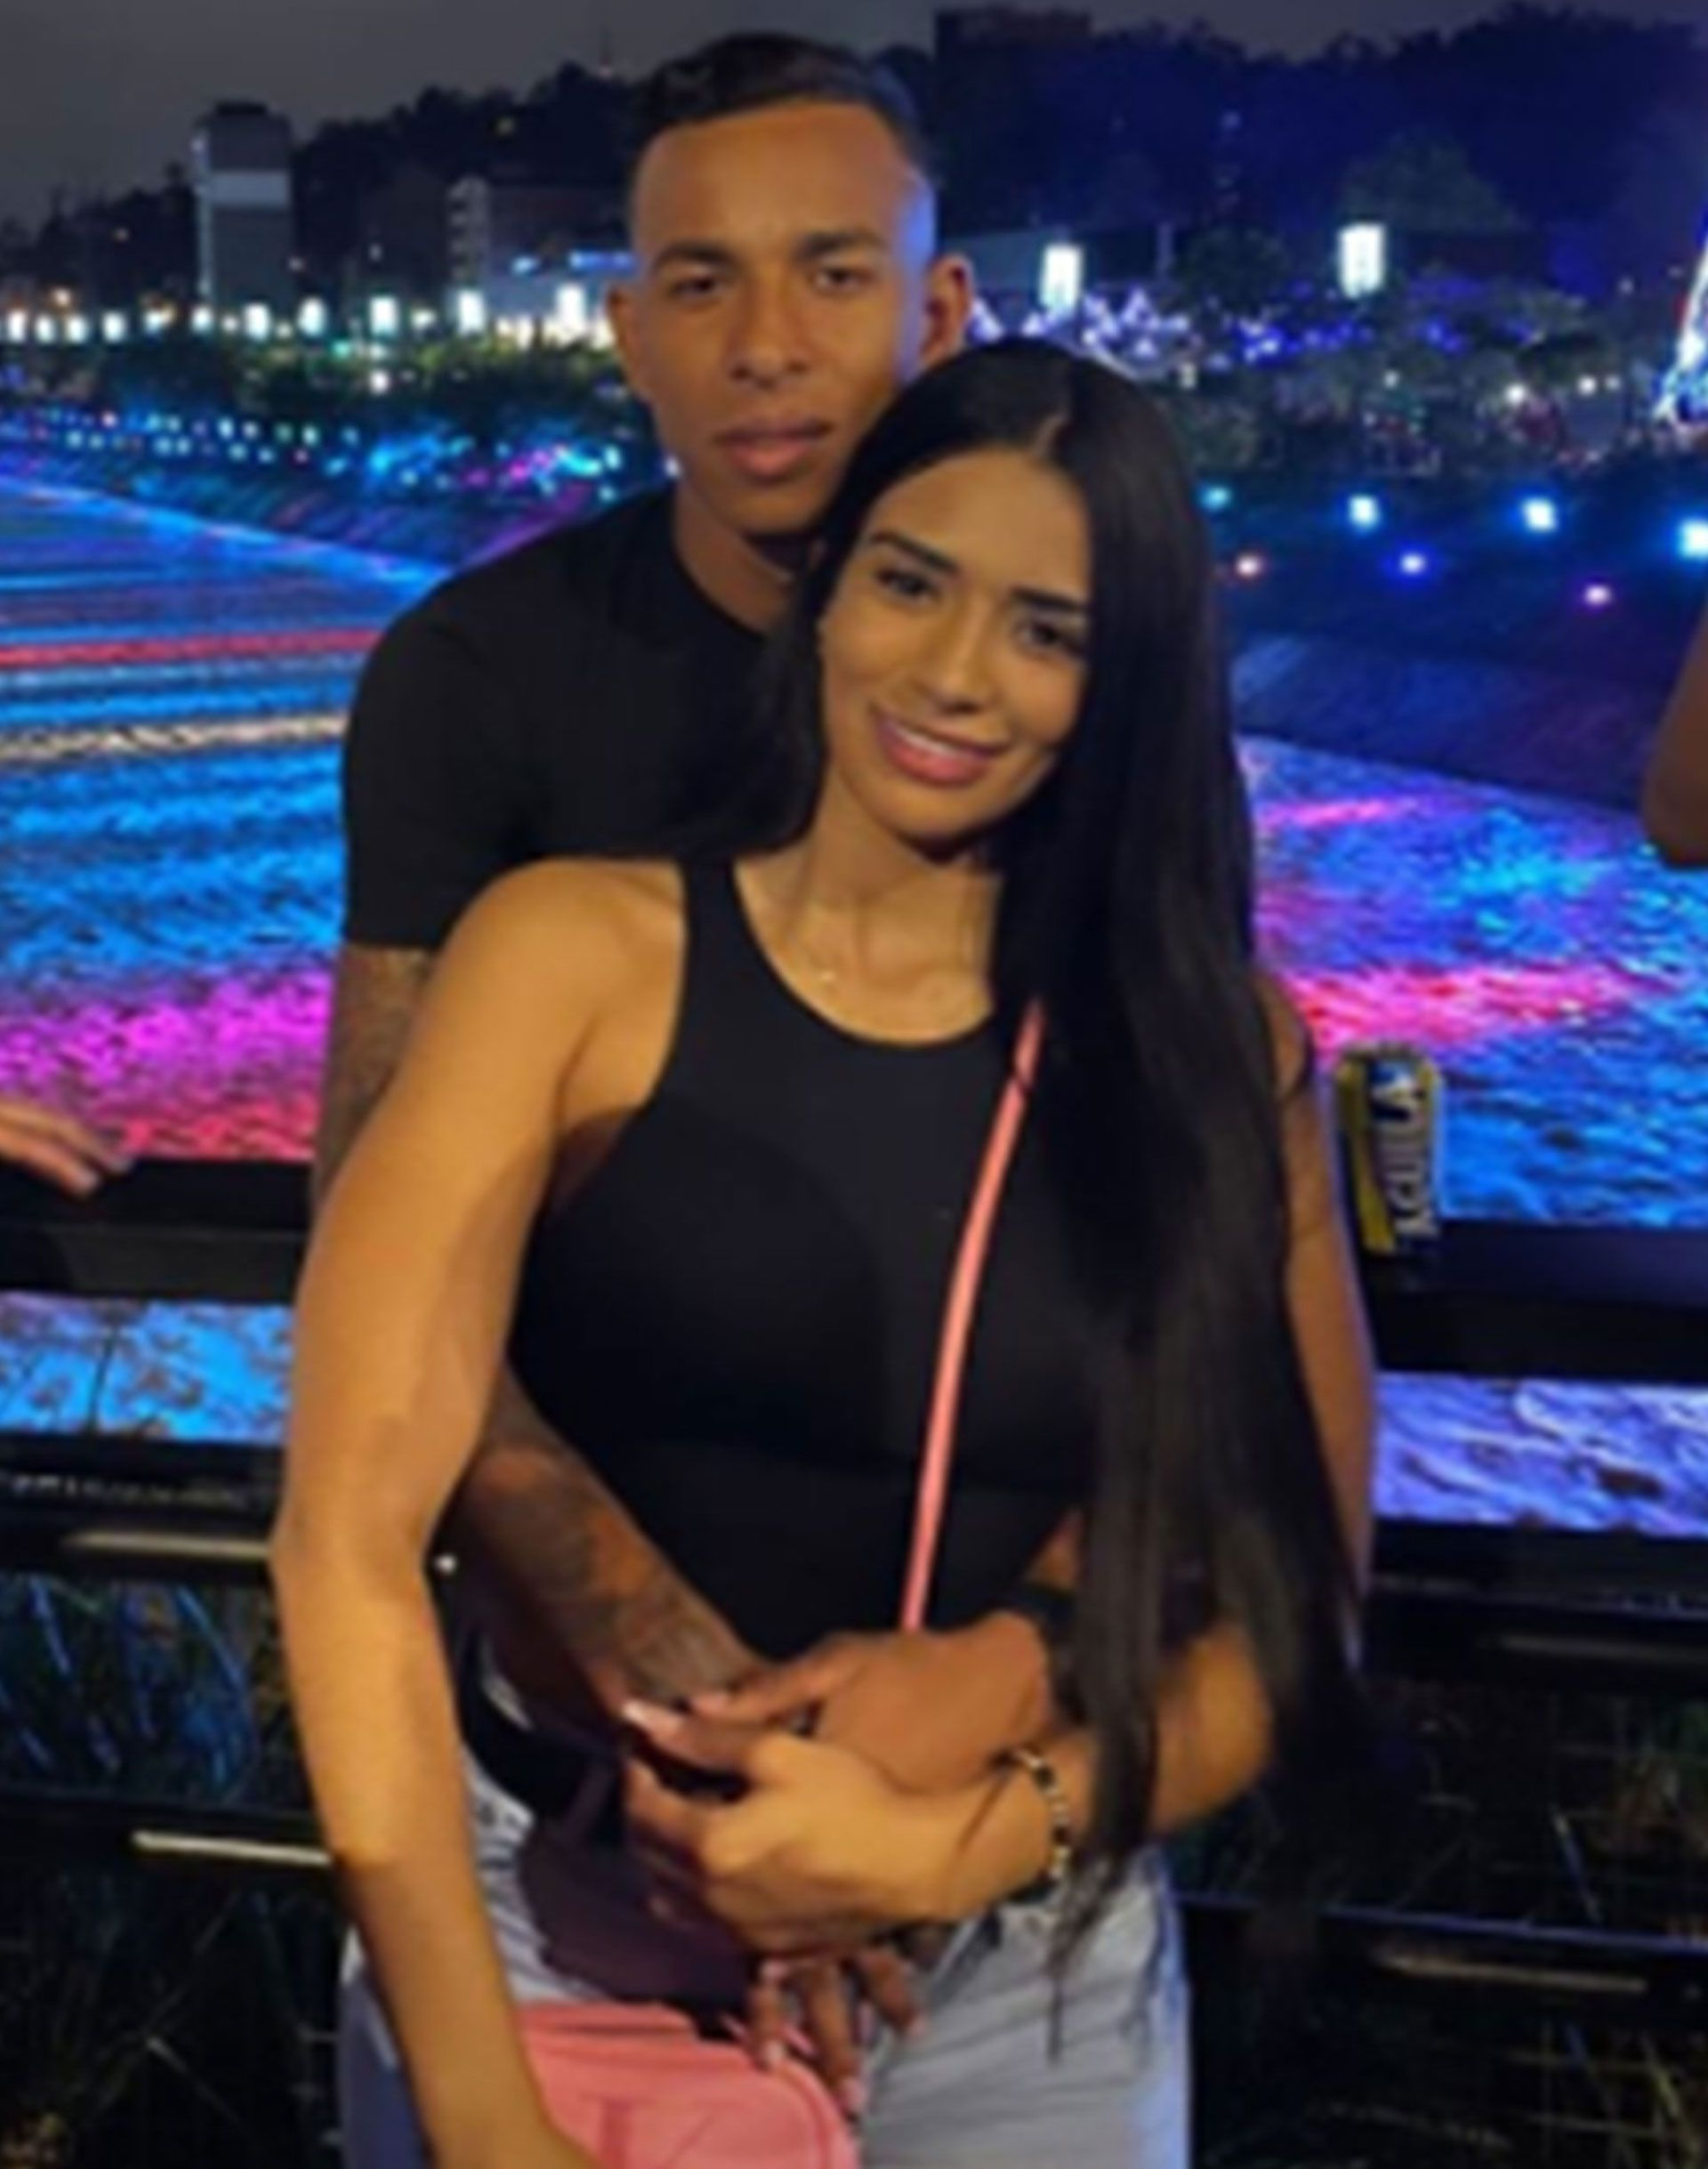 """Nunca ejercí violencia de ningún tipo sobre mi ex novia, Daniela Cortés"", escribió Villa (Foto: danicortesms)"